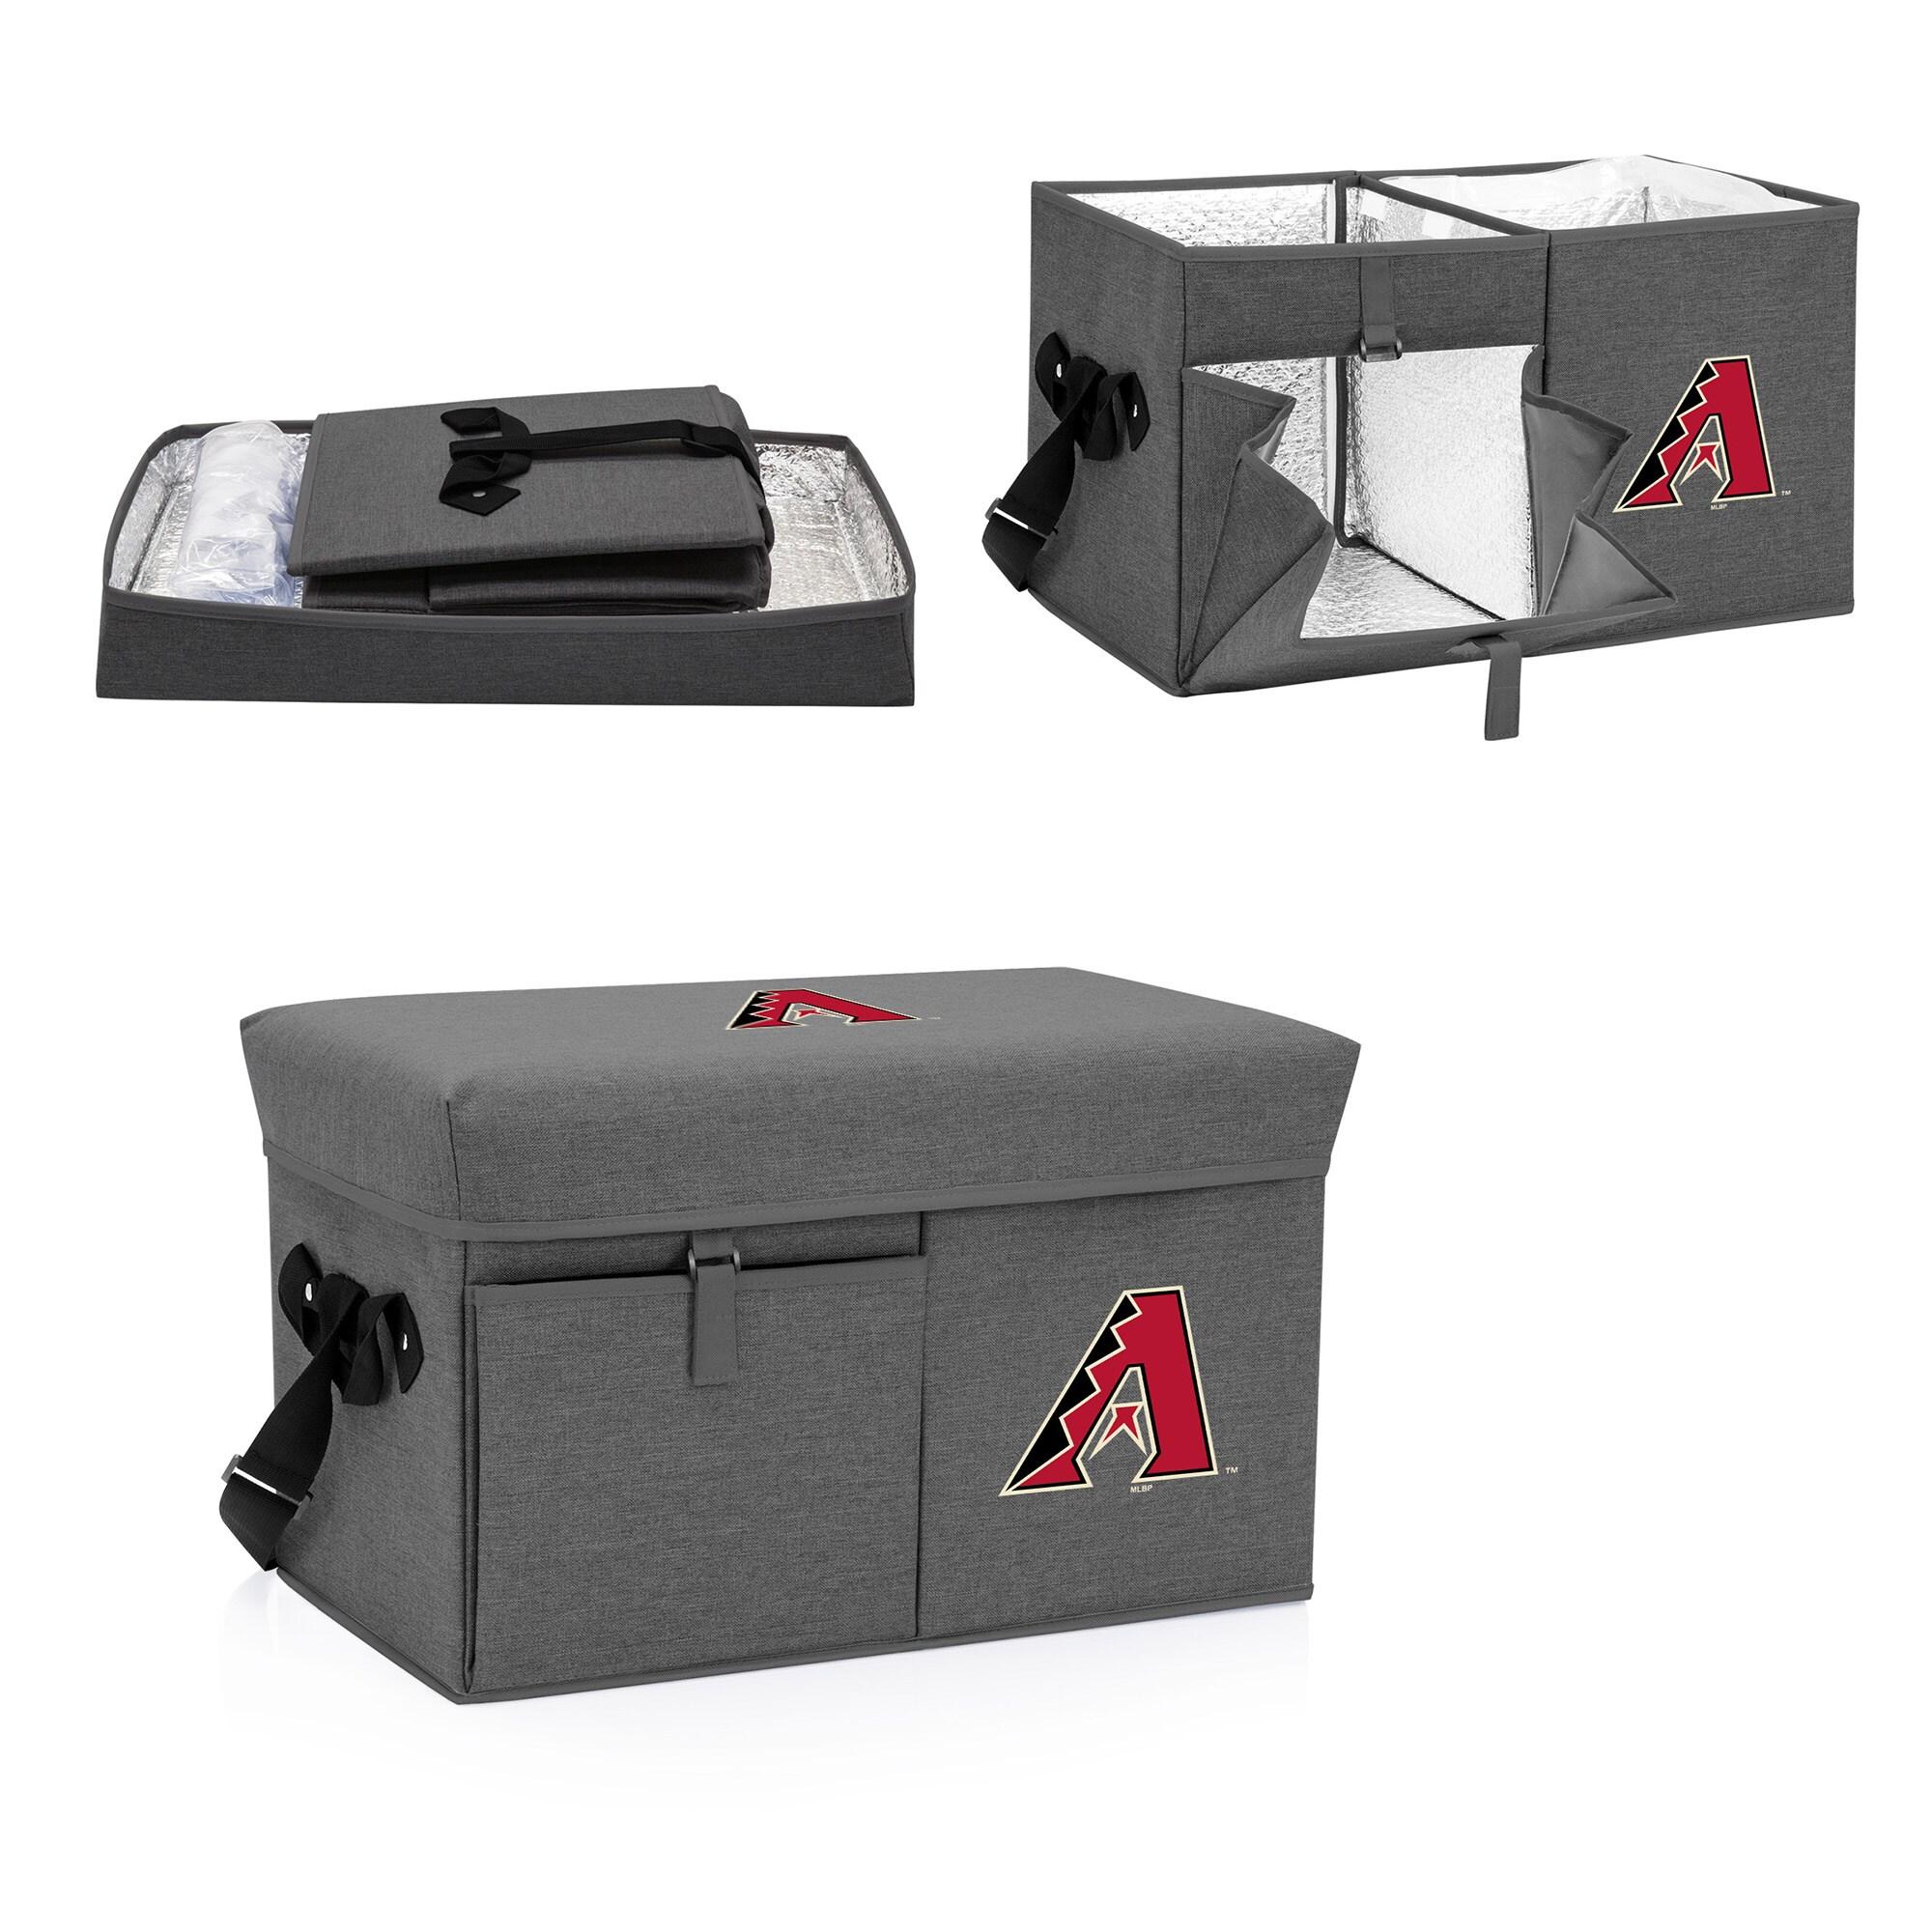 Arizona Diamondbacks Ottoman Cooler & Seat - Gray